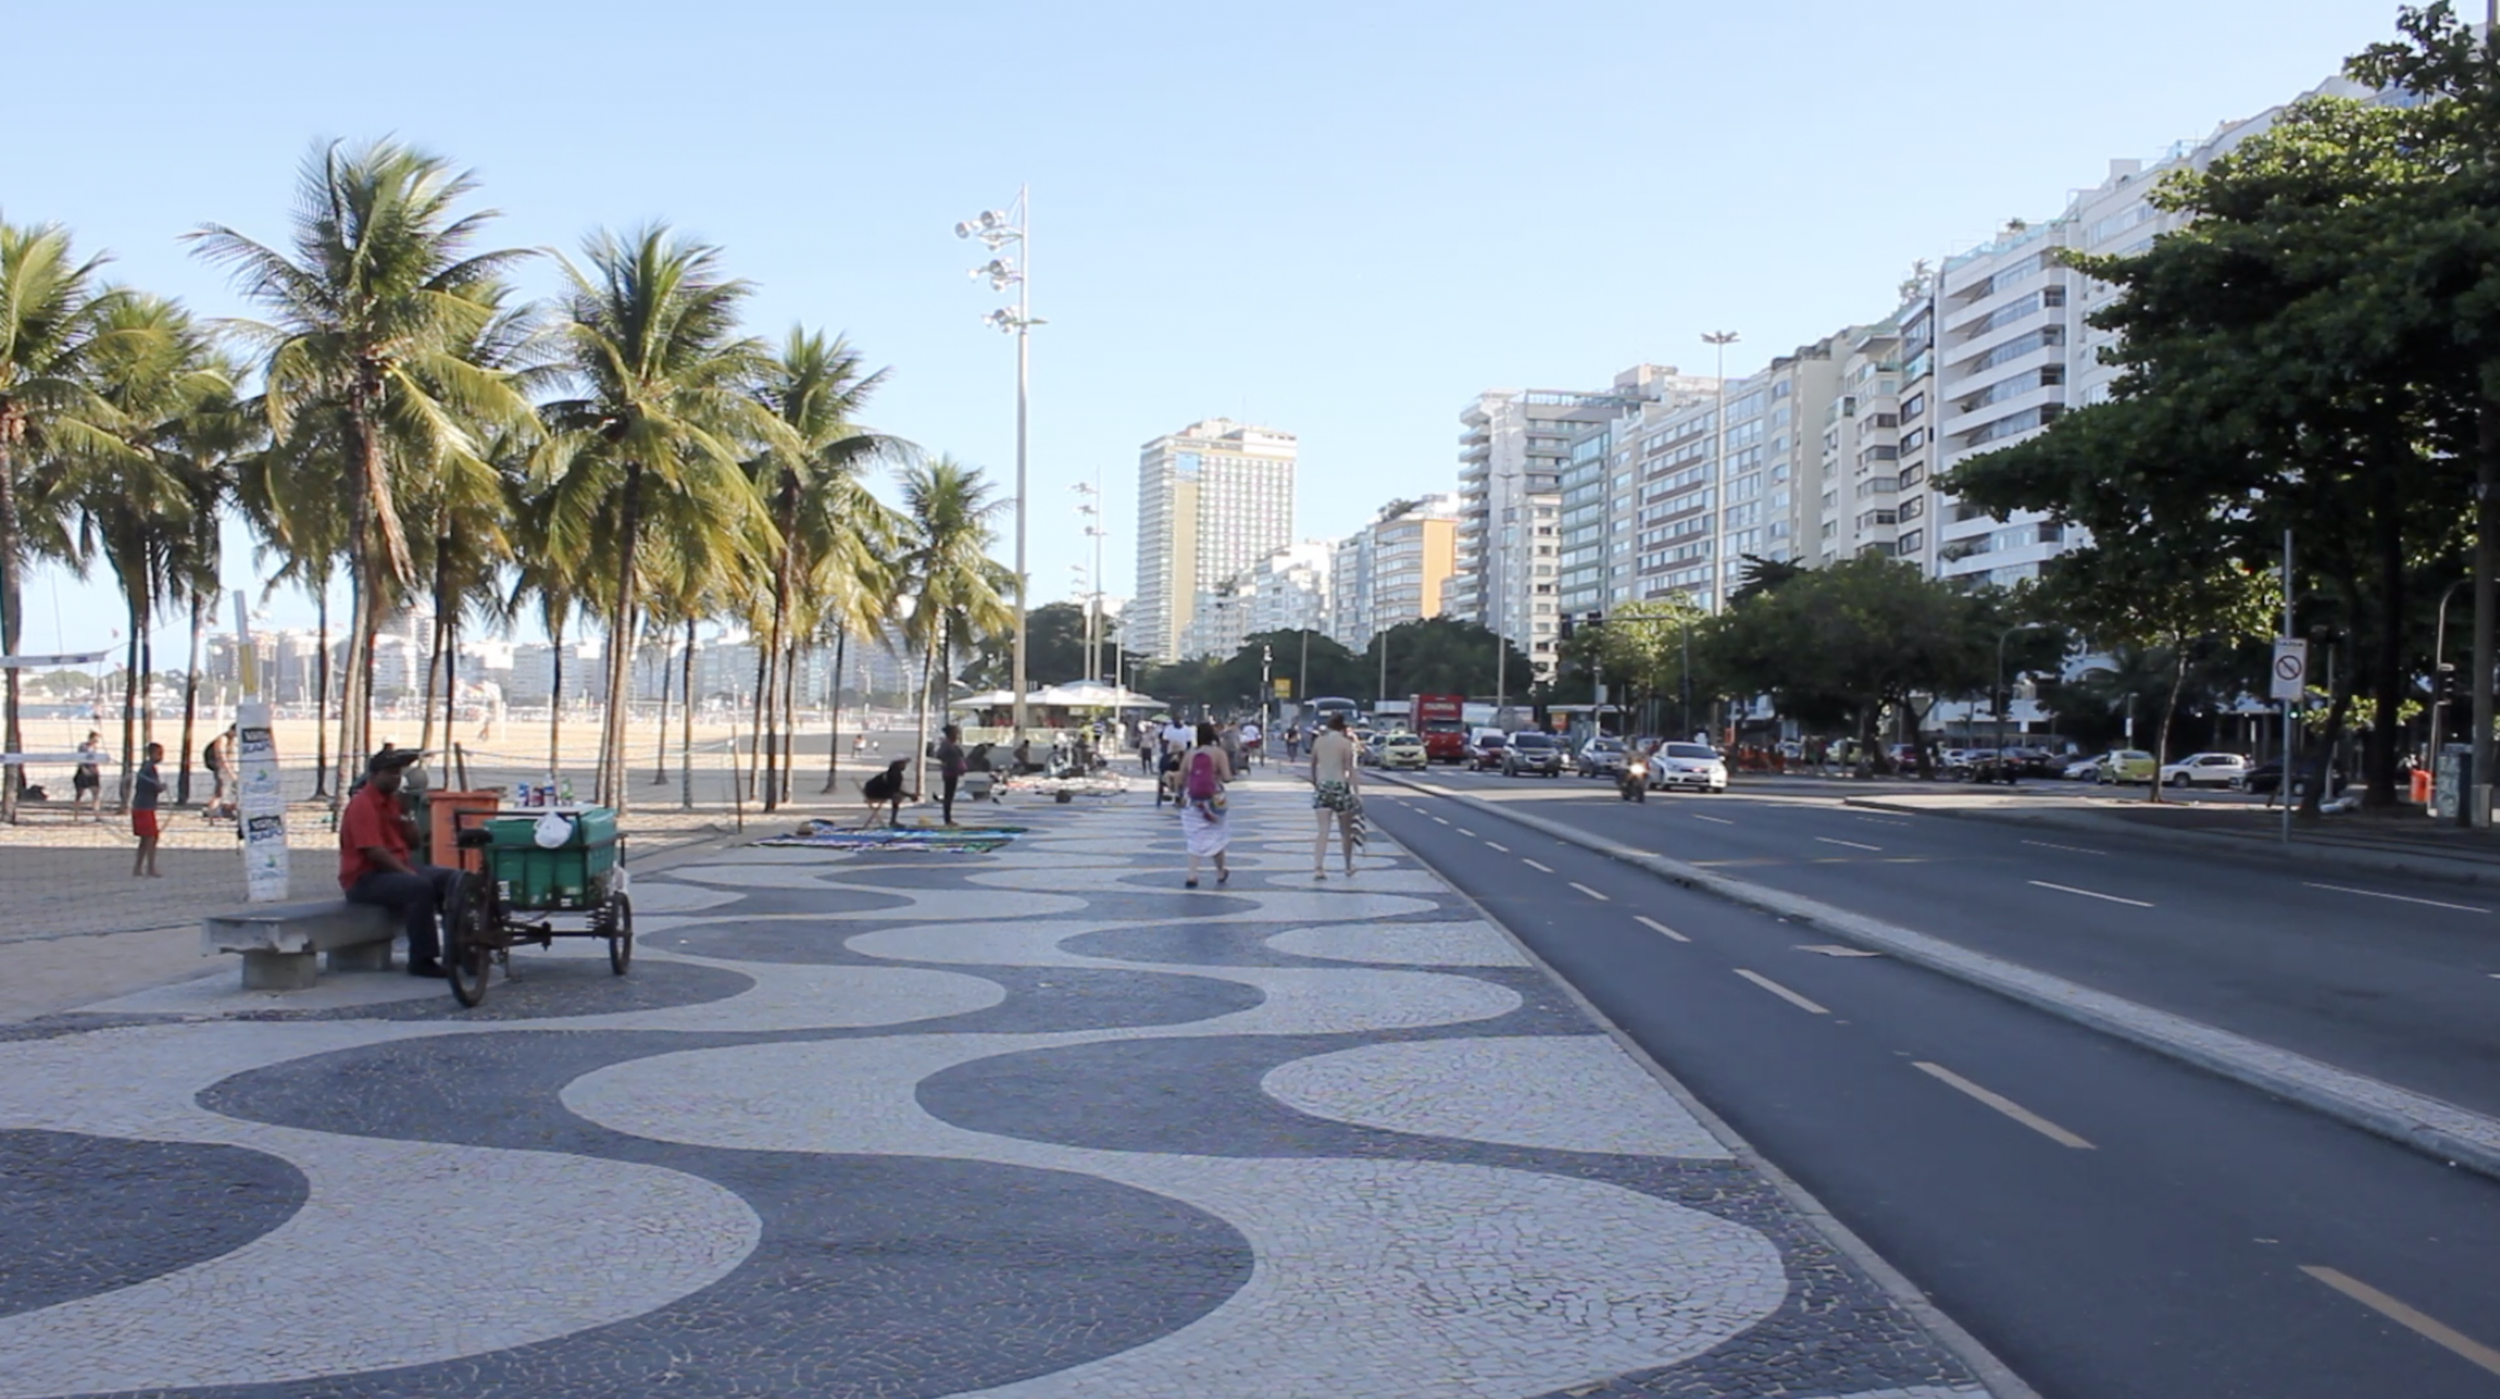 Rio de Janeiro, Brazil – Avenida Atlântica promenade